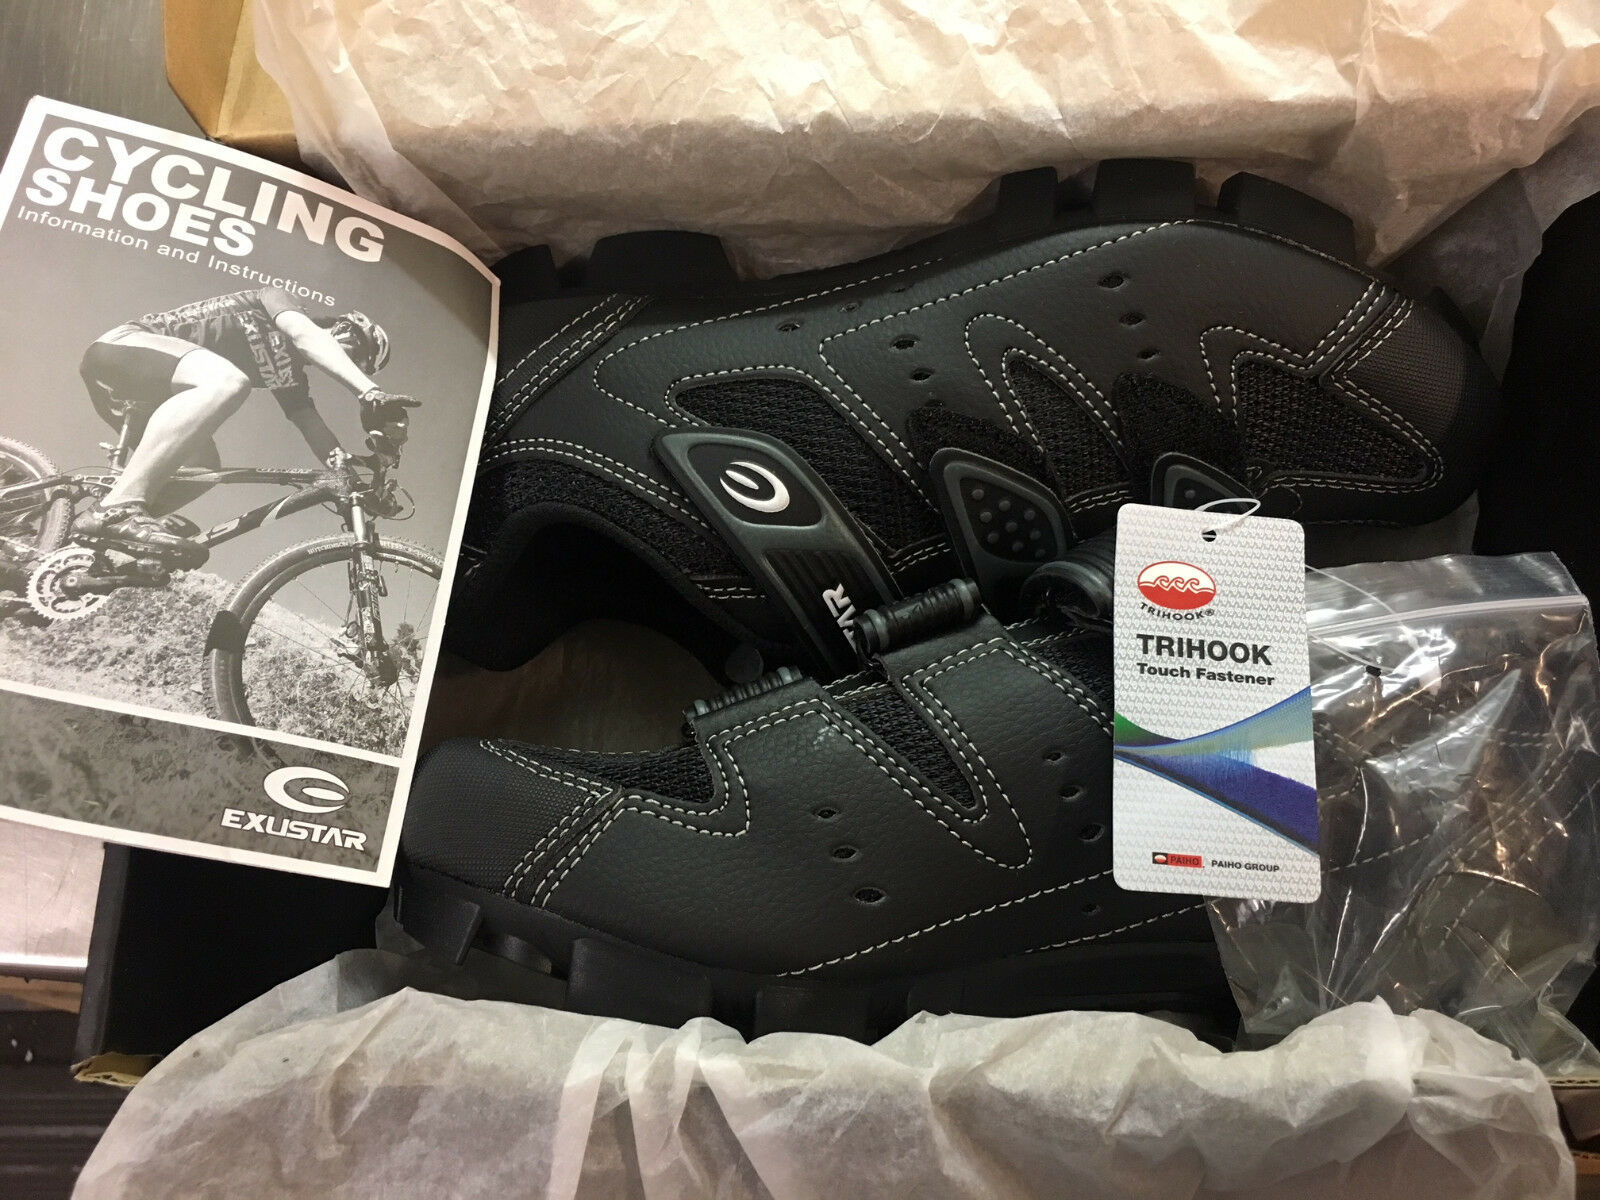 Exustar Cycling shoes E-SM324 Men's Size 6.5   Euro 39   Brand New in Box